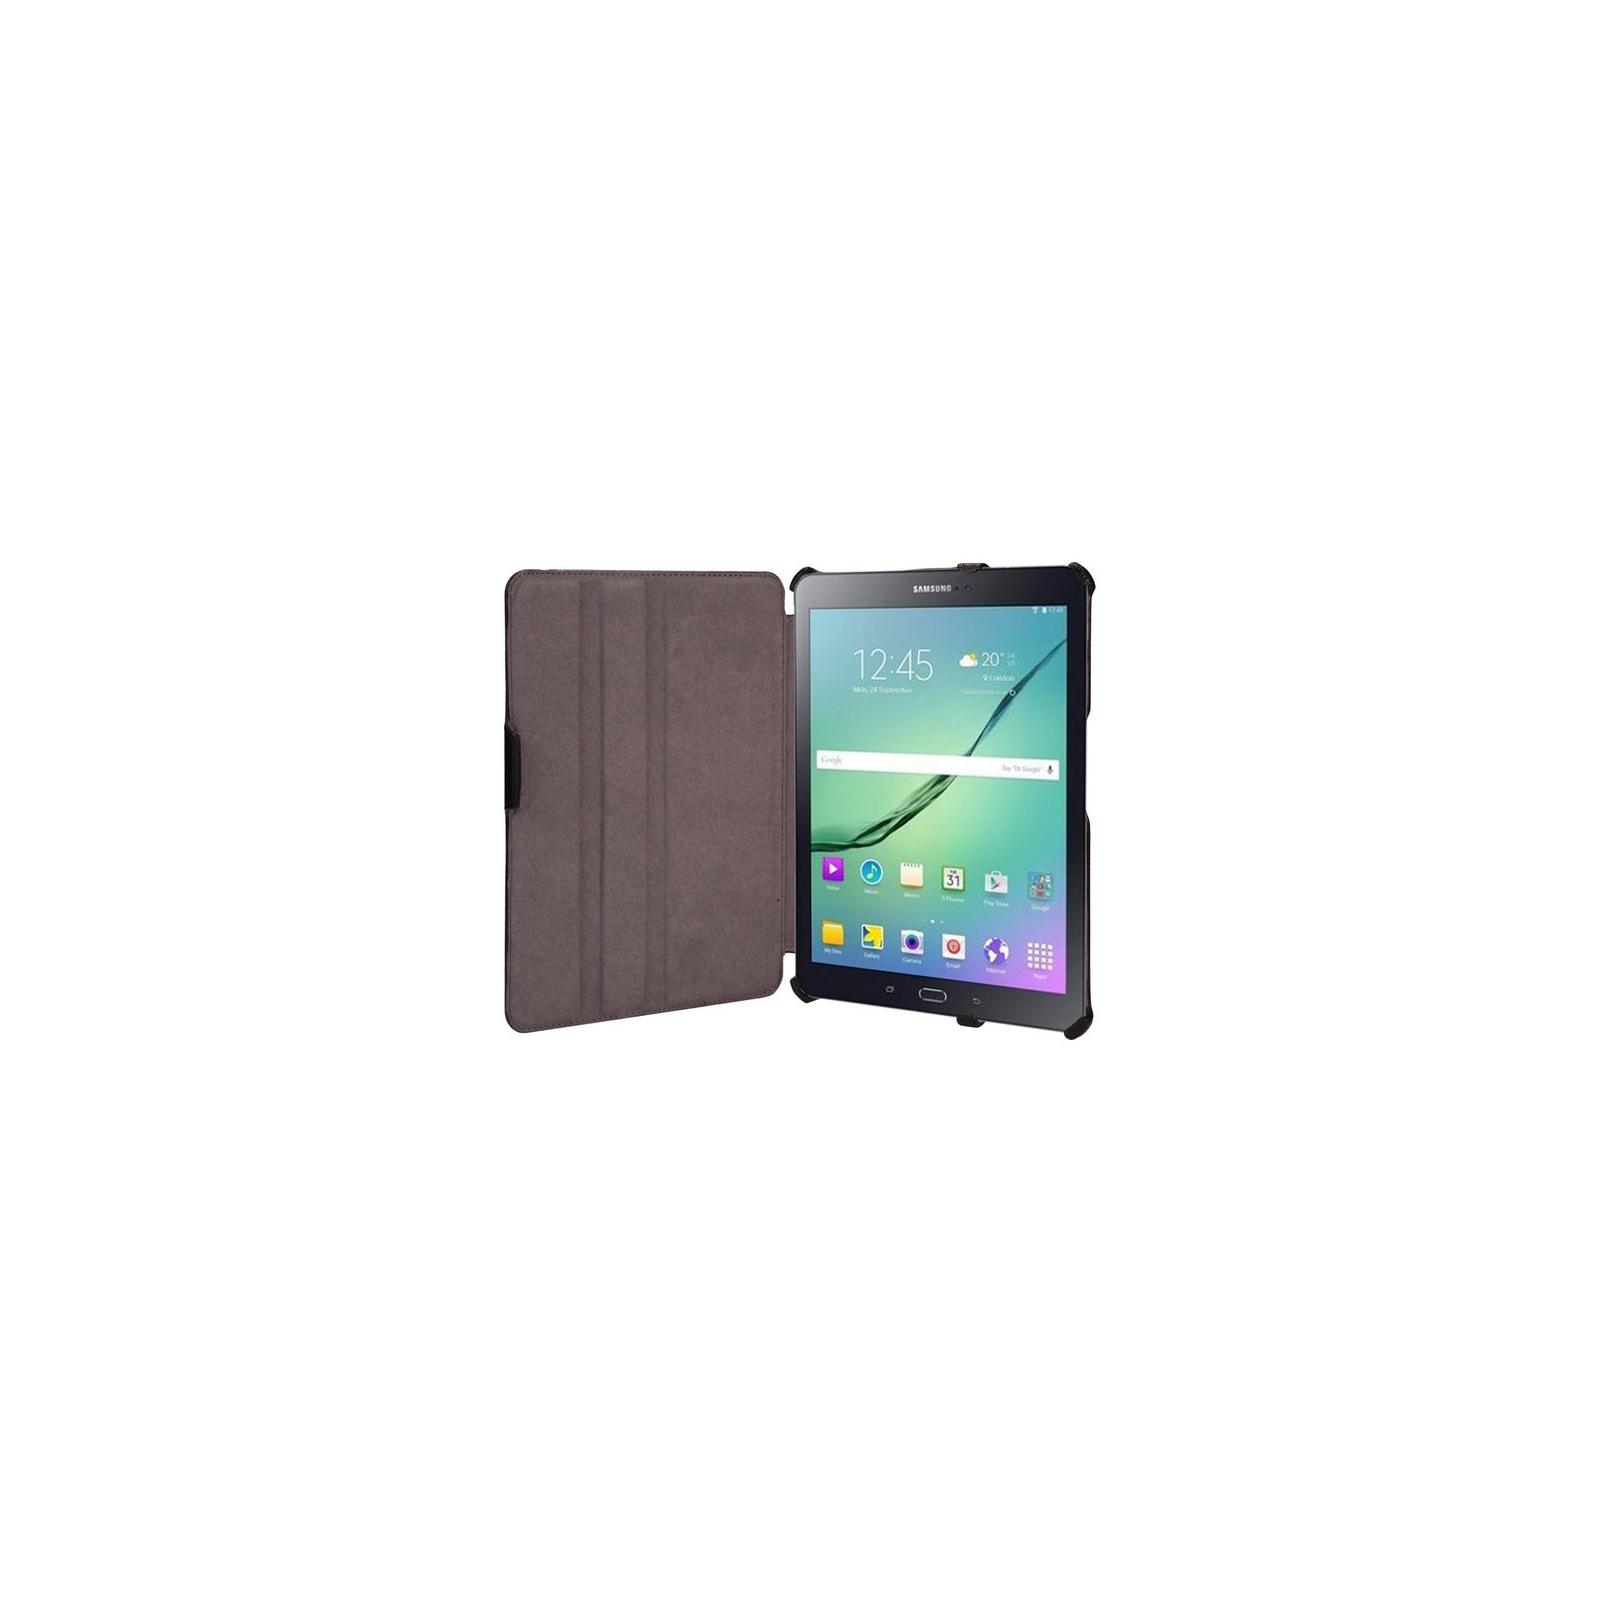 Чехол для планшета AirOn для Samsung Galaxy Tab S 2 8.0 black (4822352777418) изображение 8